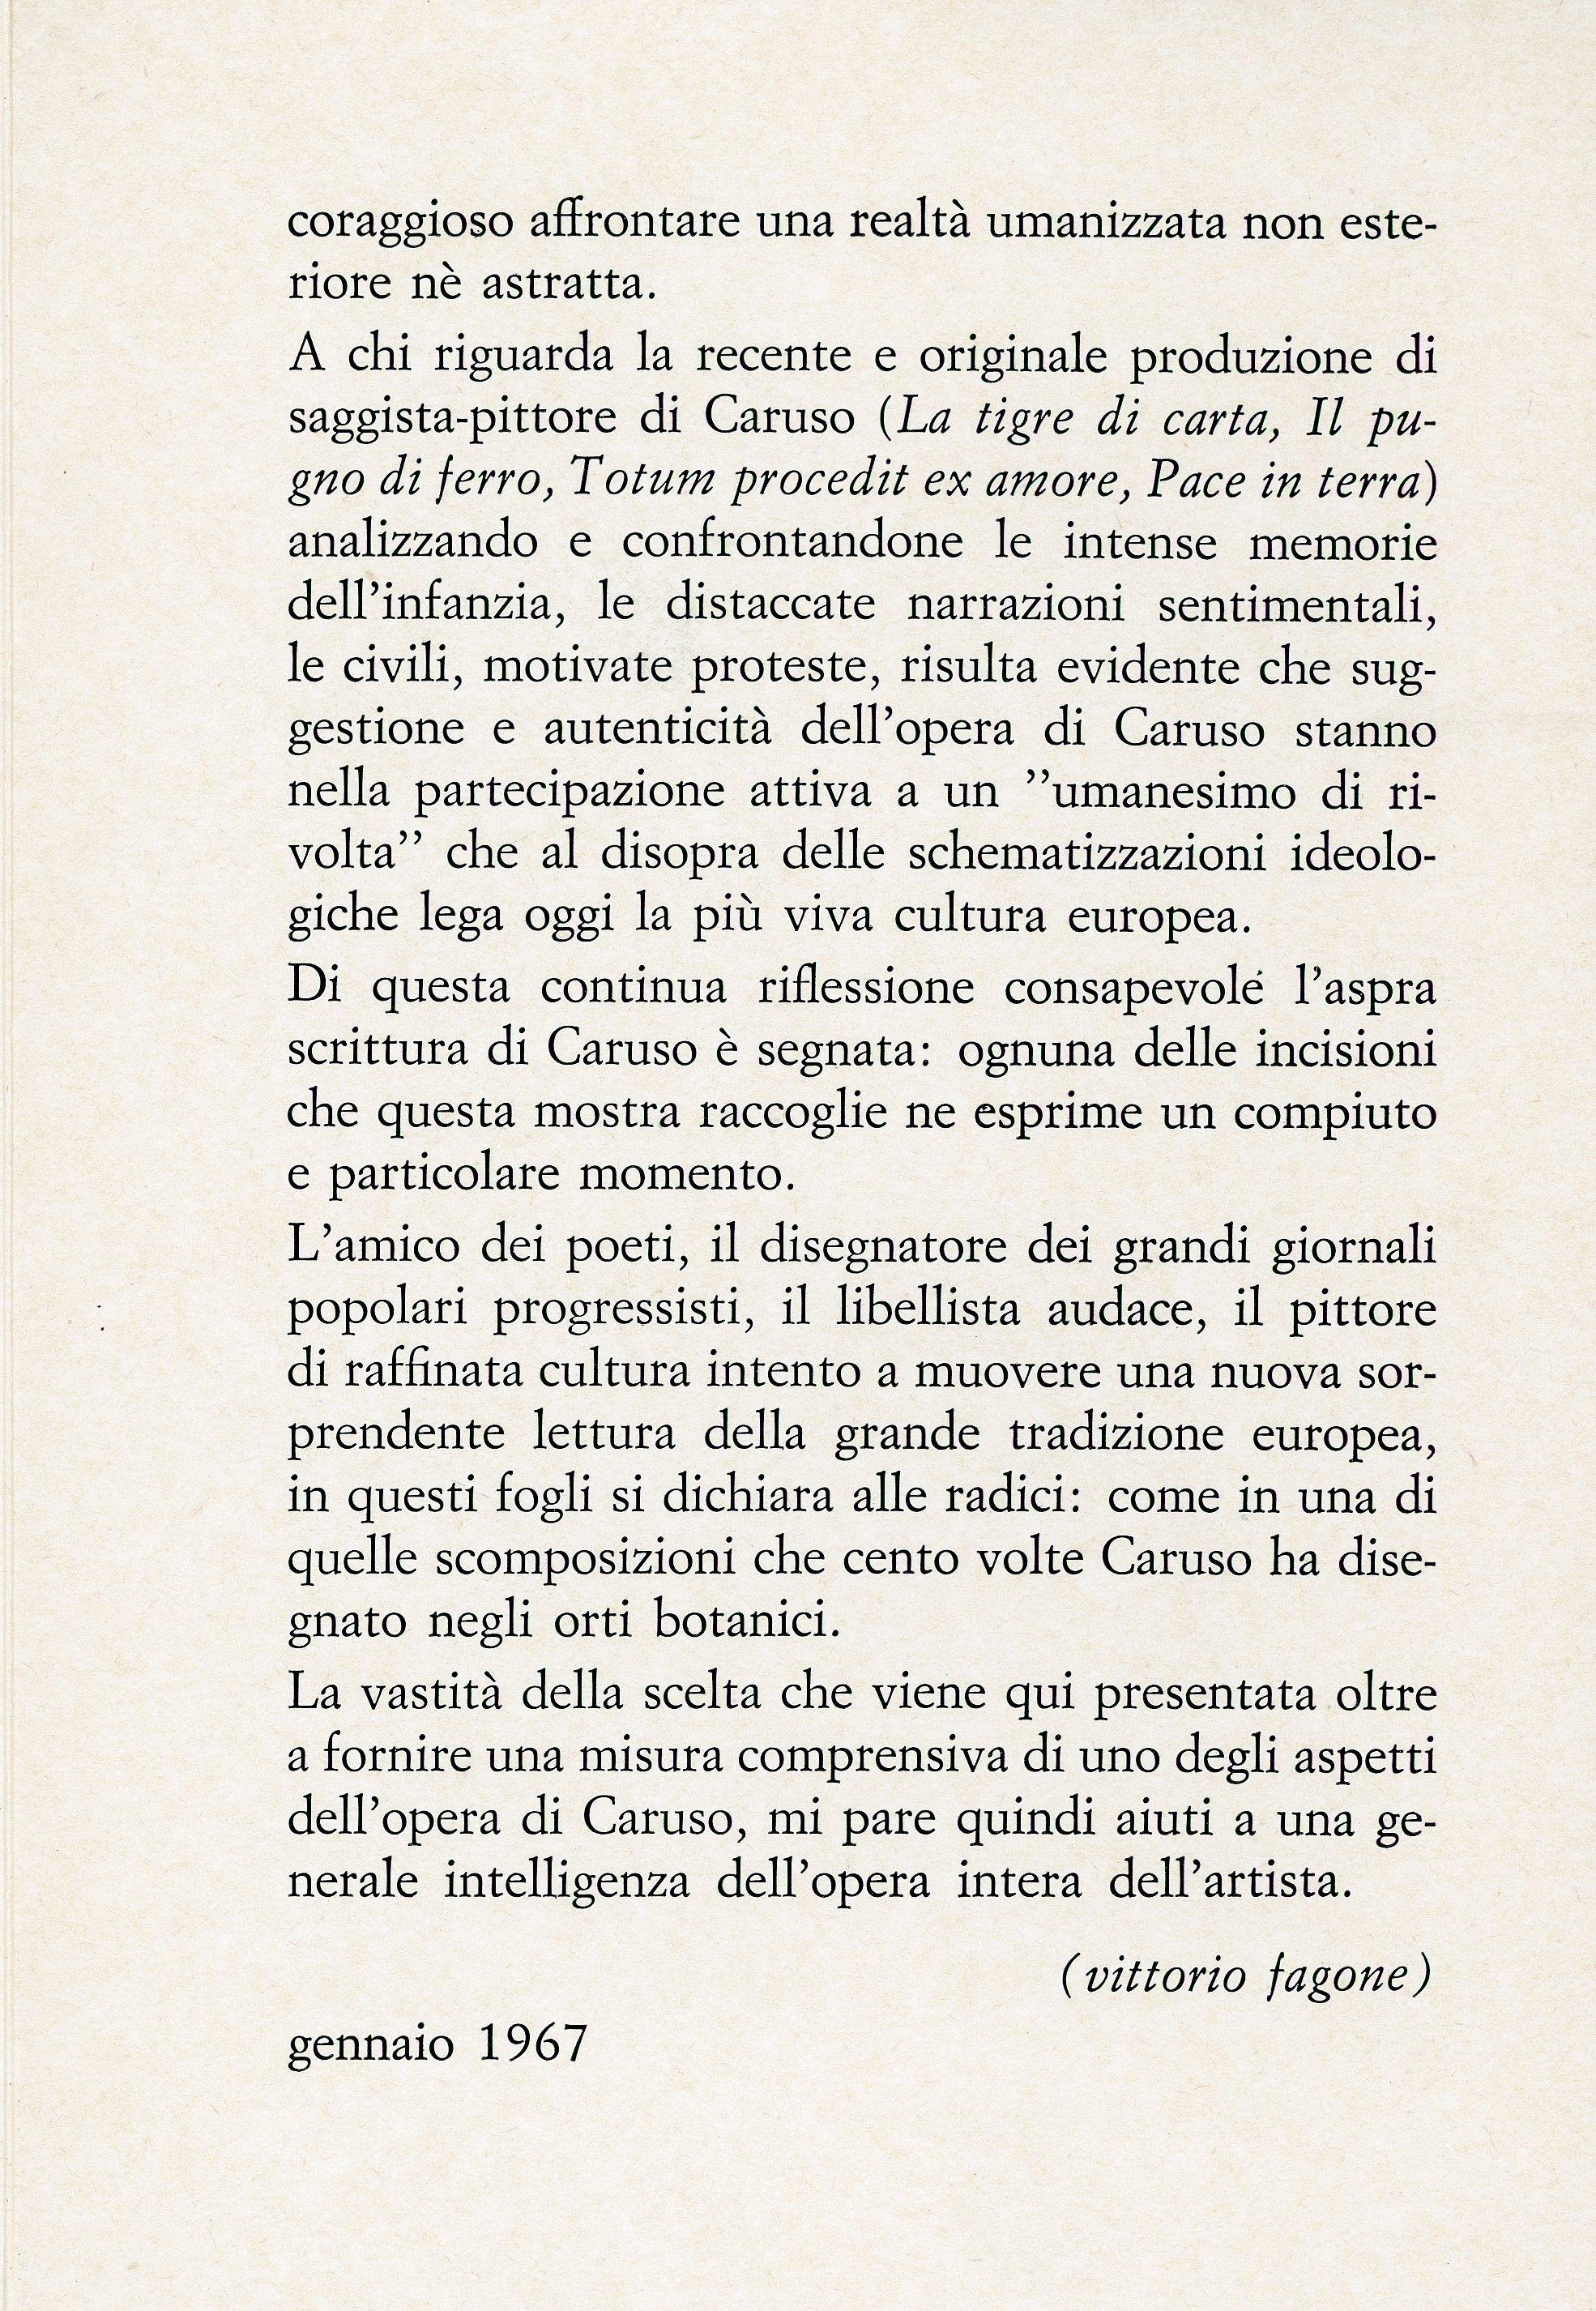 1967-02 Libreria Ghelfi - Bruno Caruso_05.jpg